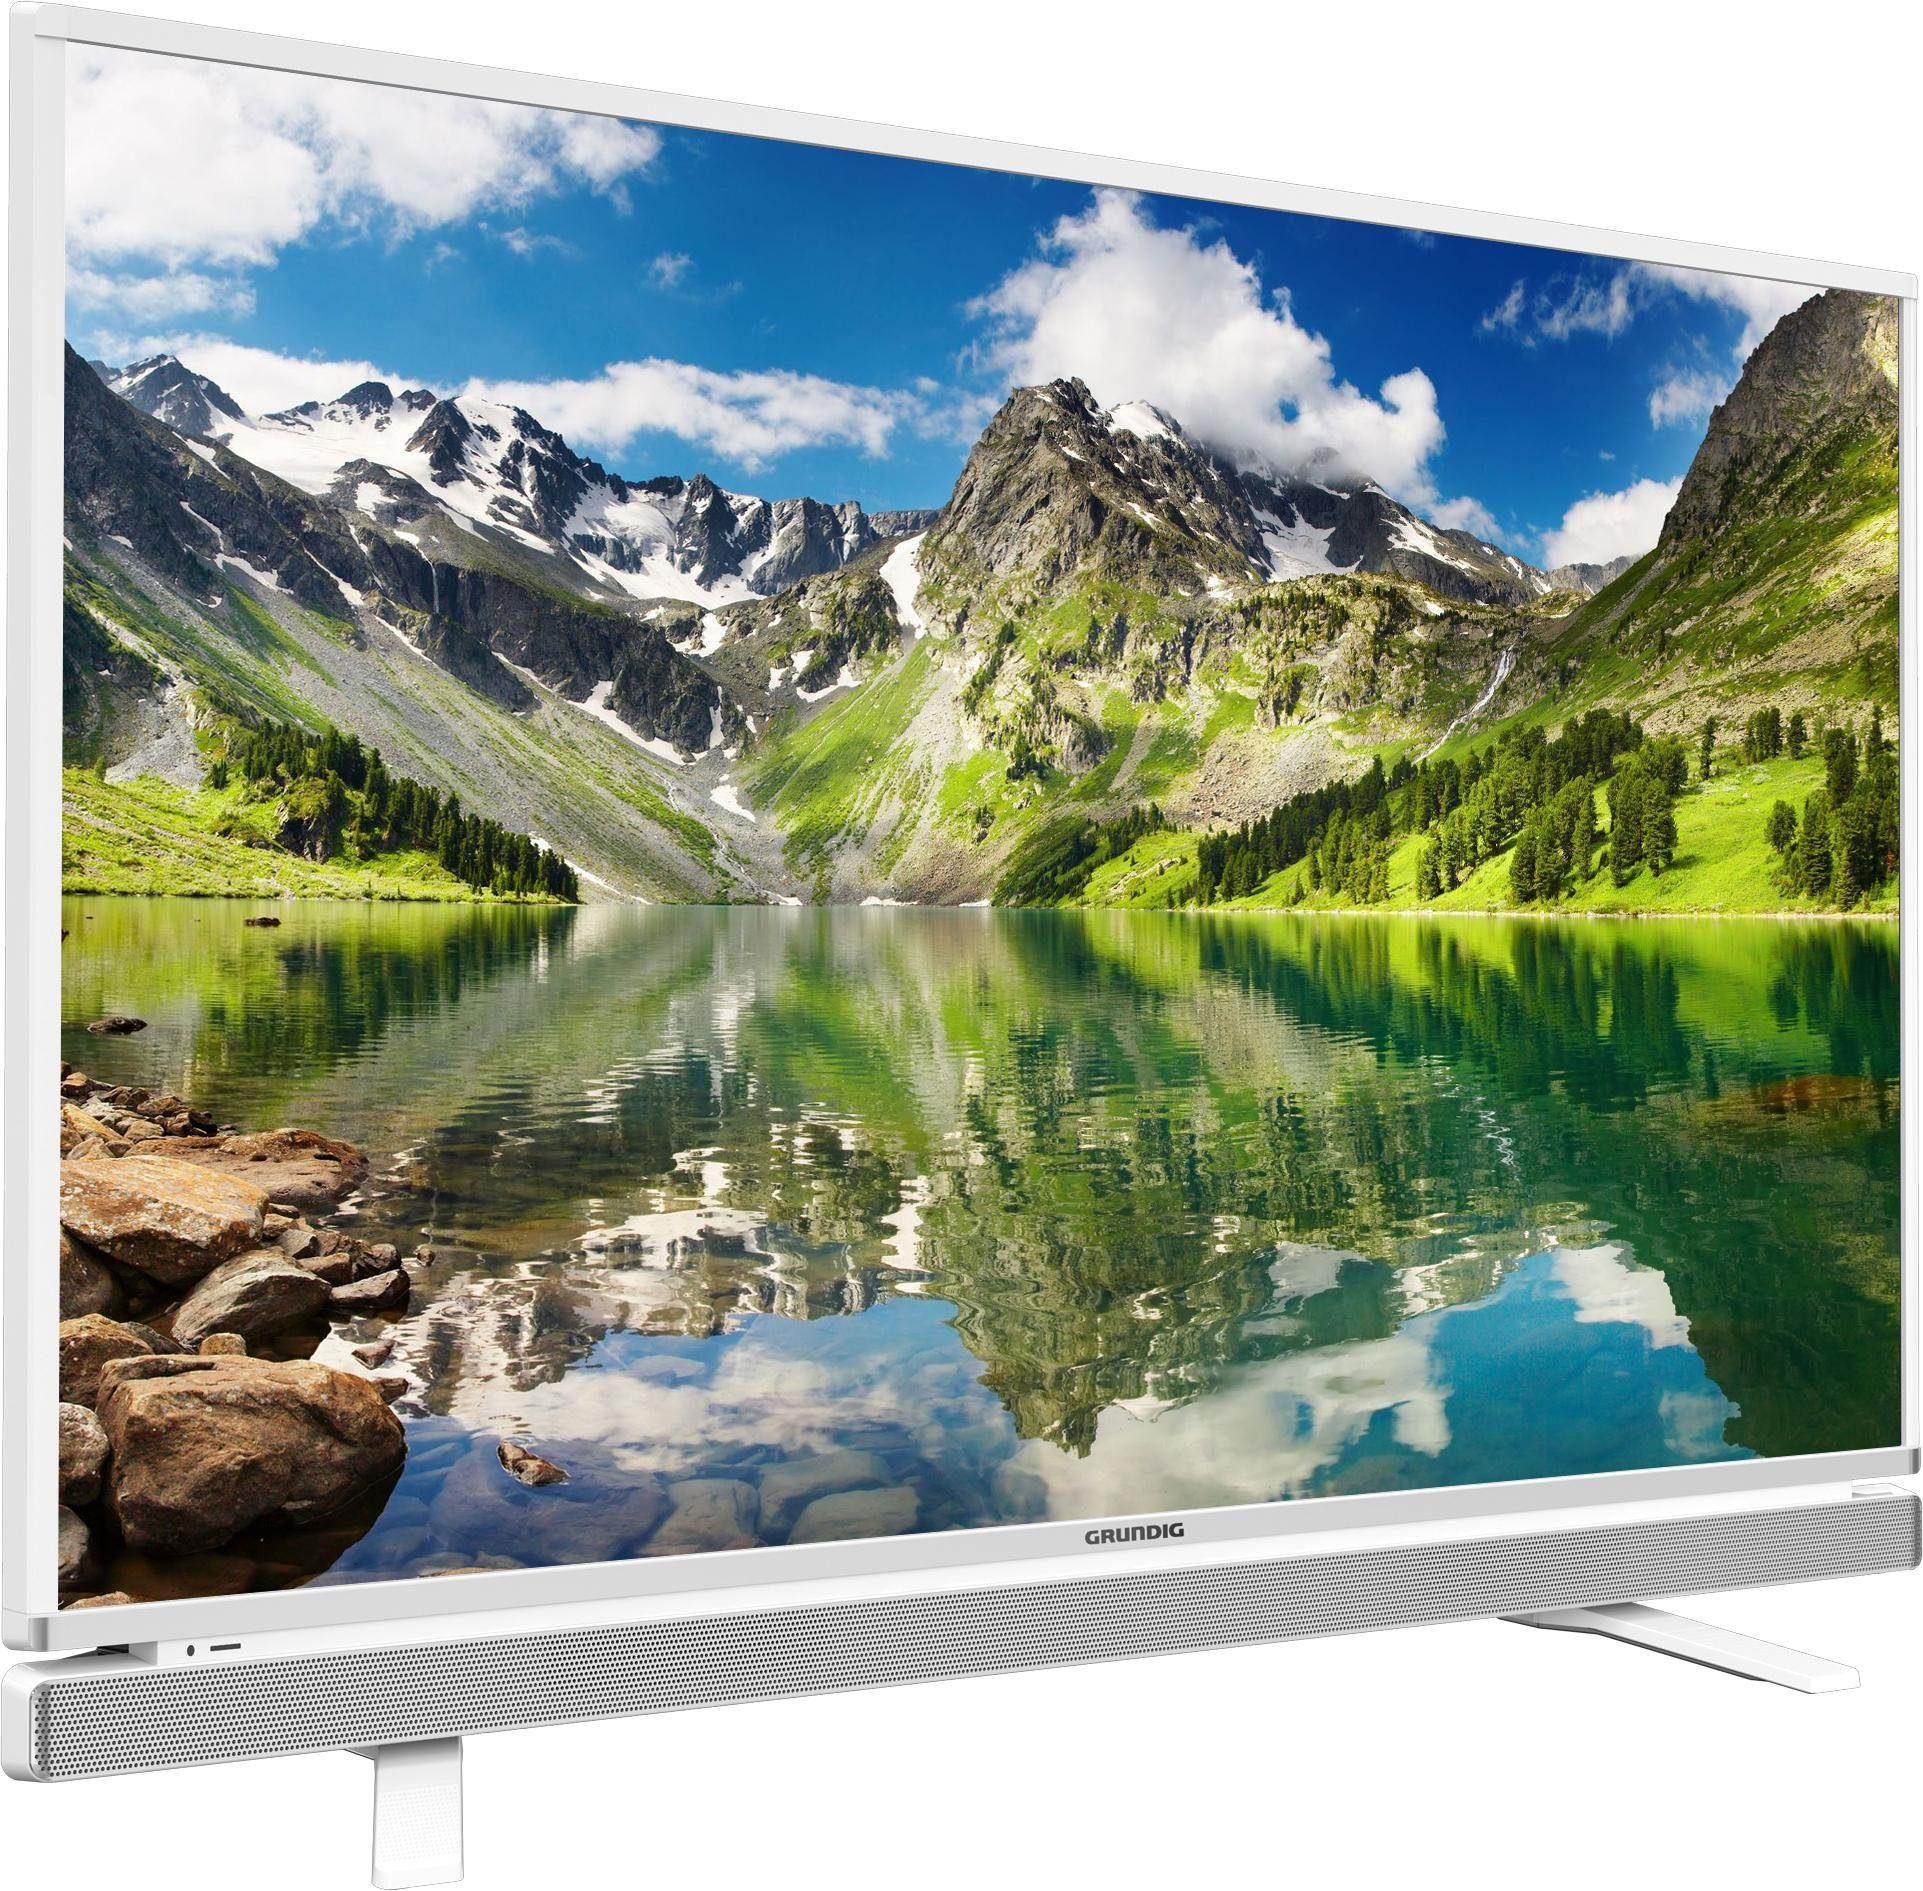 Grundig 43 GFW 6628, LED Fernseher, 108 cm (43 Zoll), 1080p (Full HD), Smart-TV